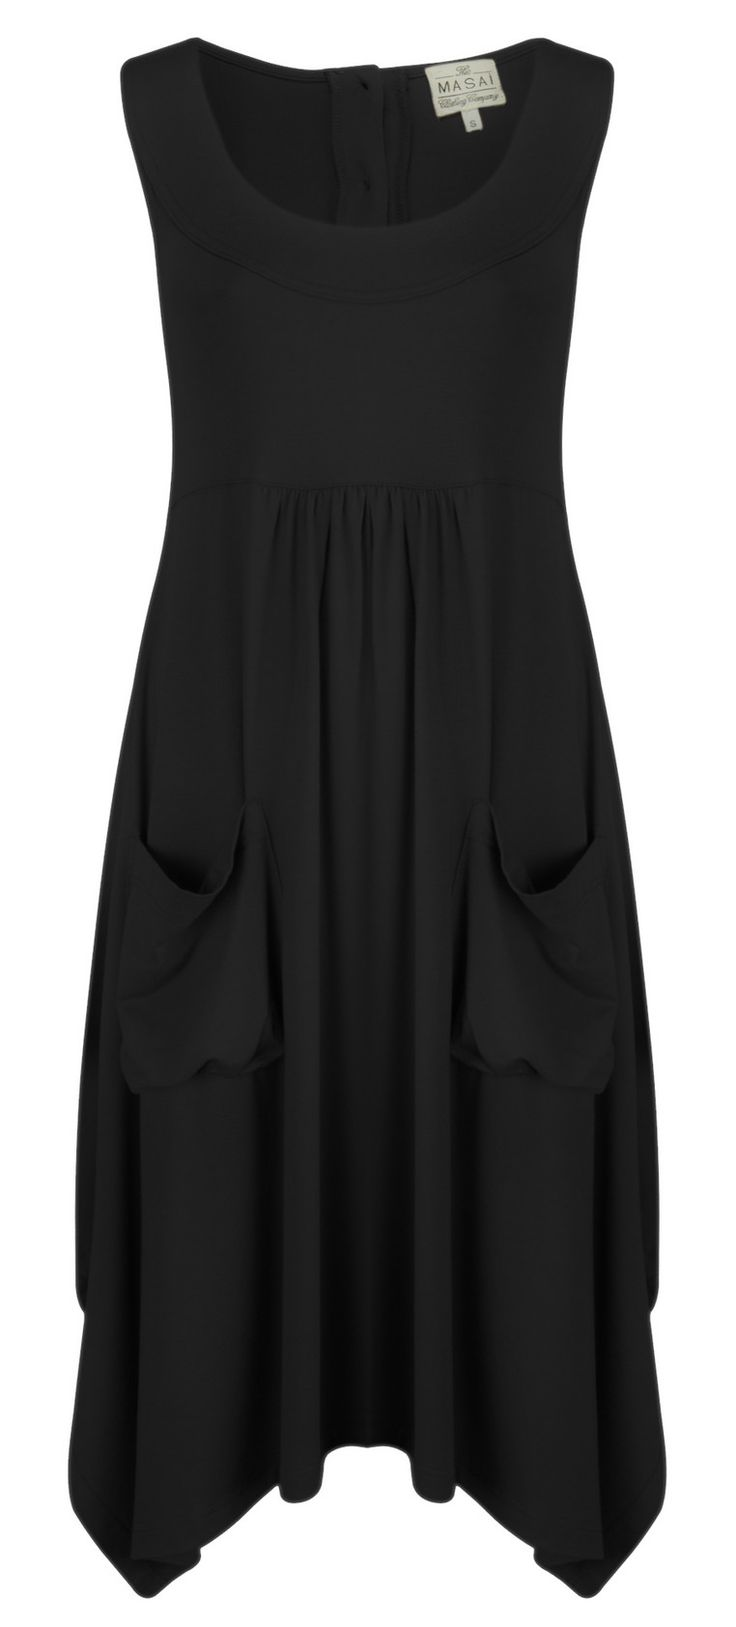 ◽️ Masai Clothing Orinda Wide Bottom Dress (Black) at Gemini Woman